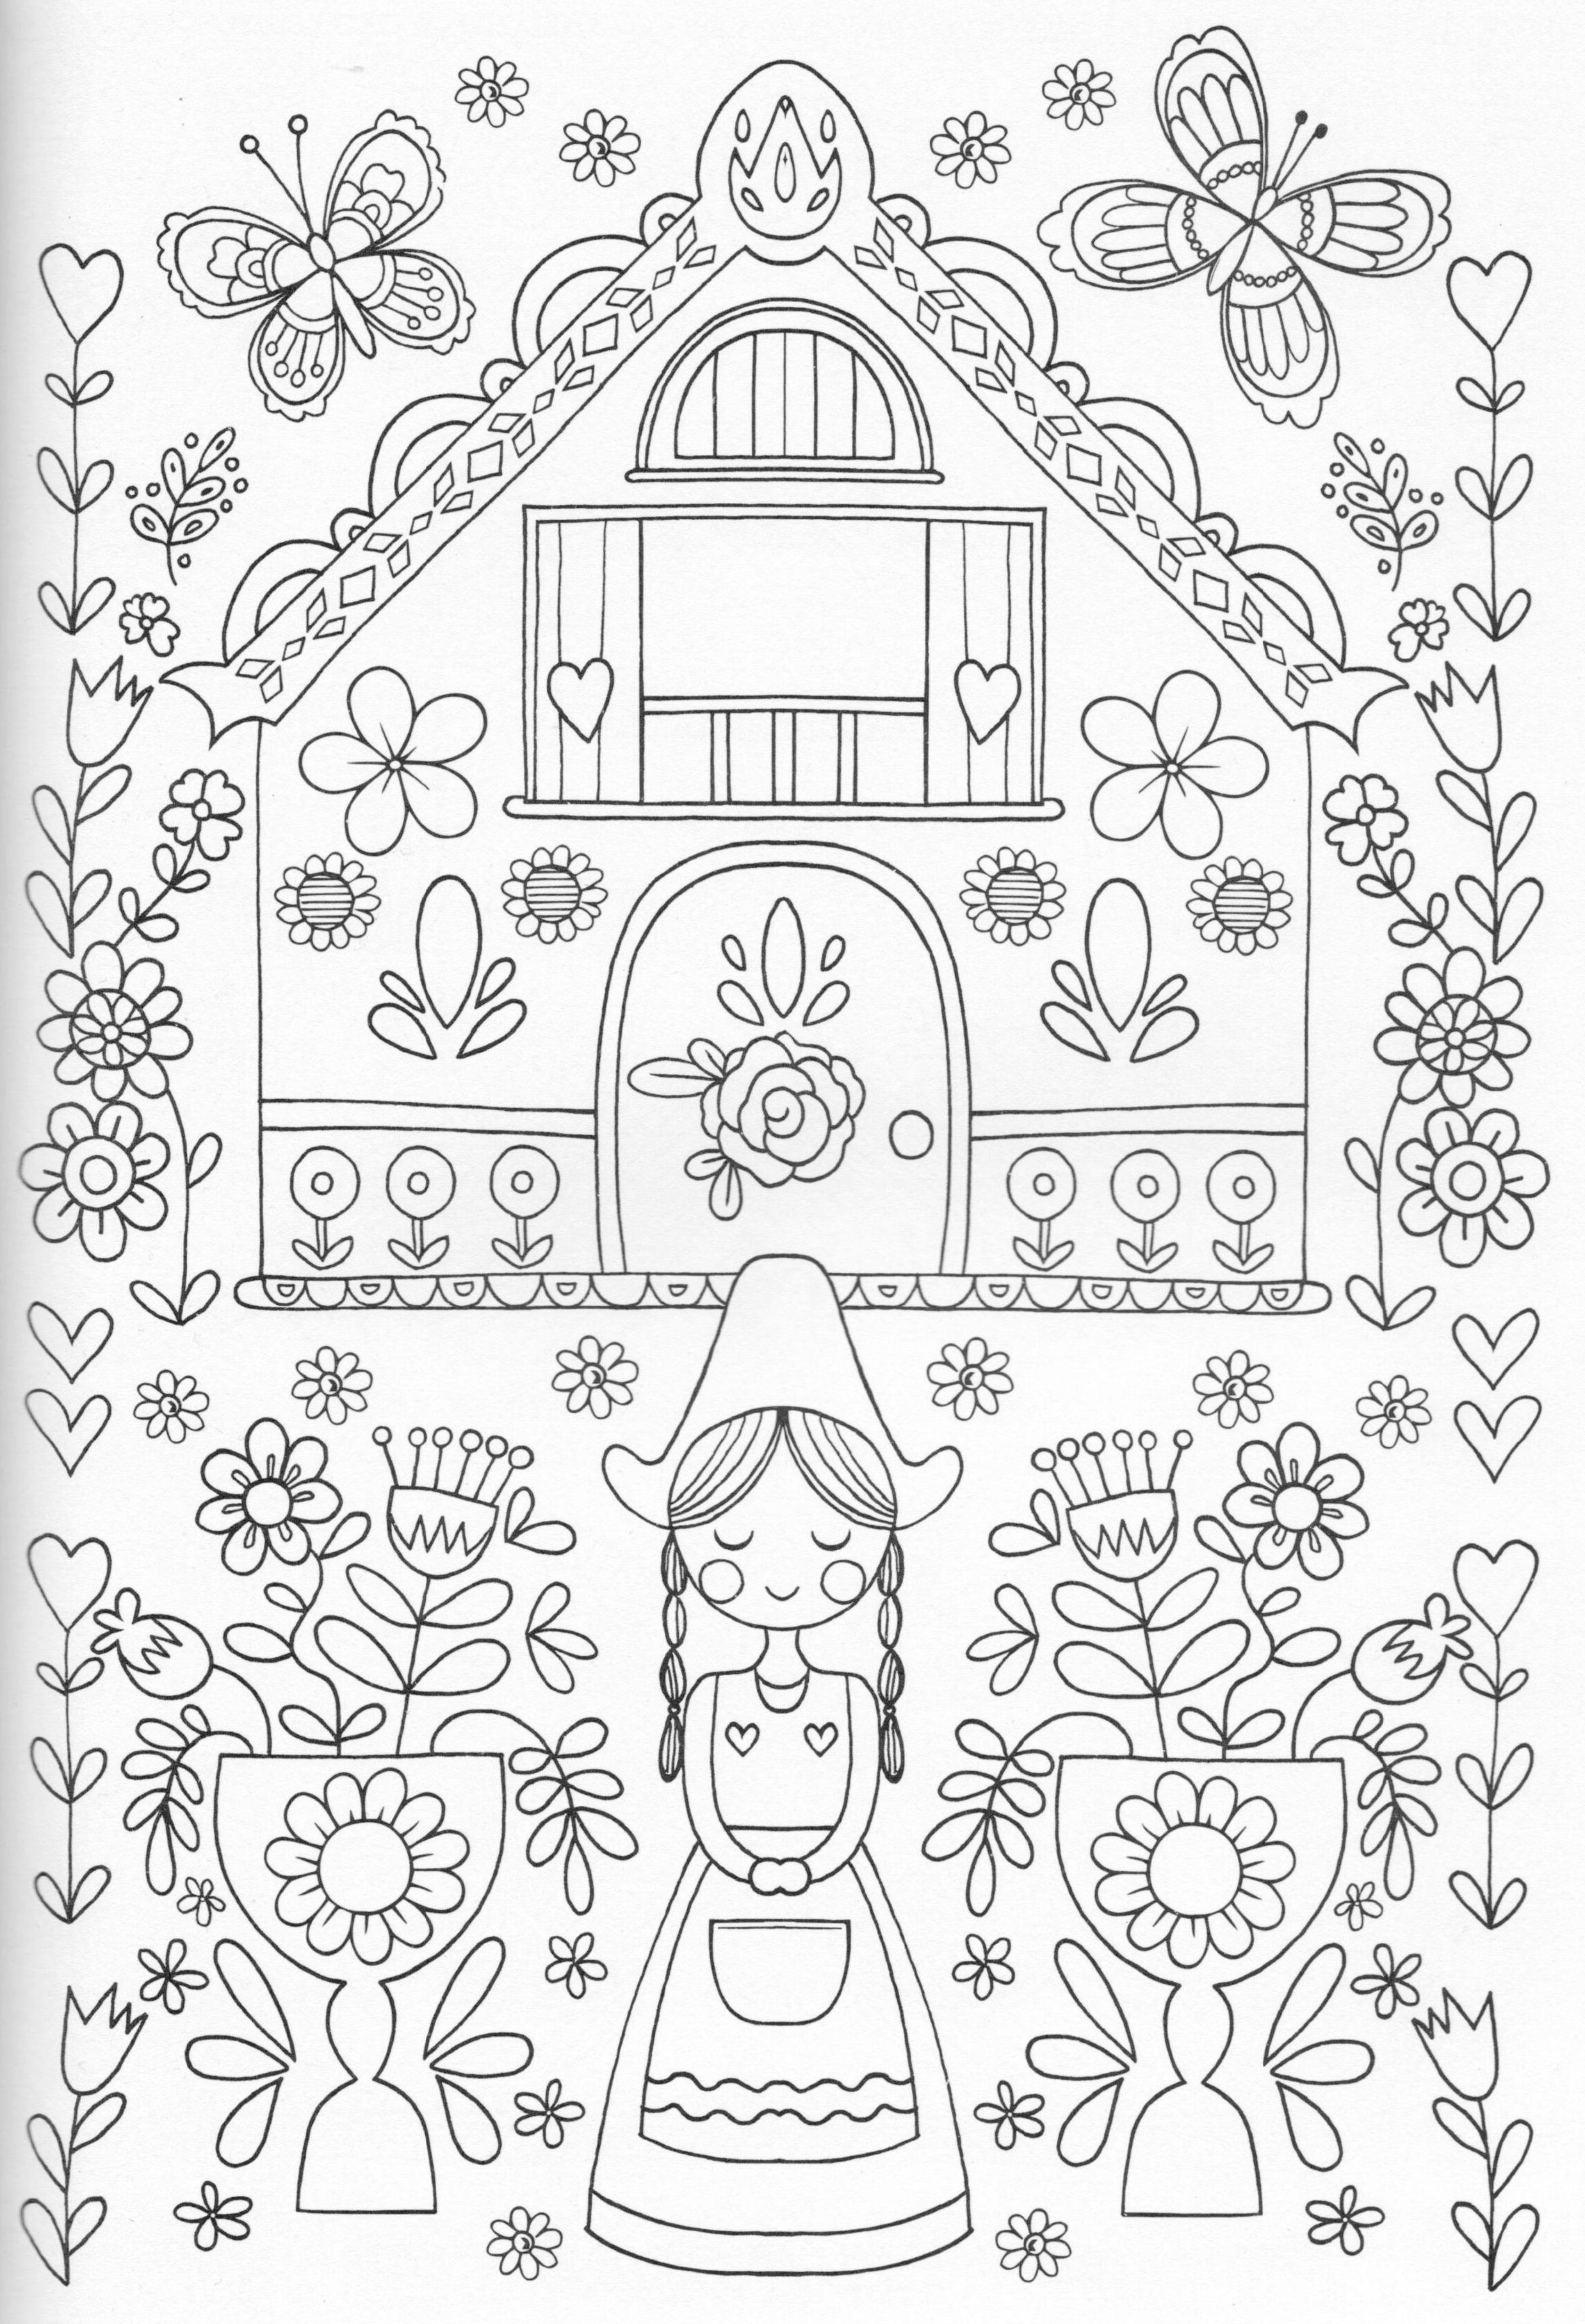 Pin by Helen Kaczalski on Printables   Páginas para ...